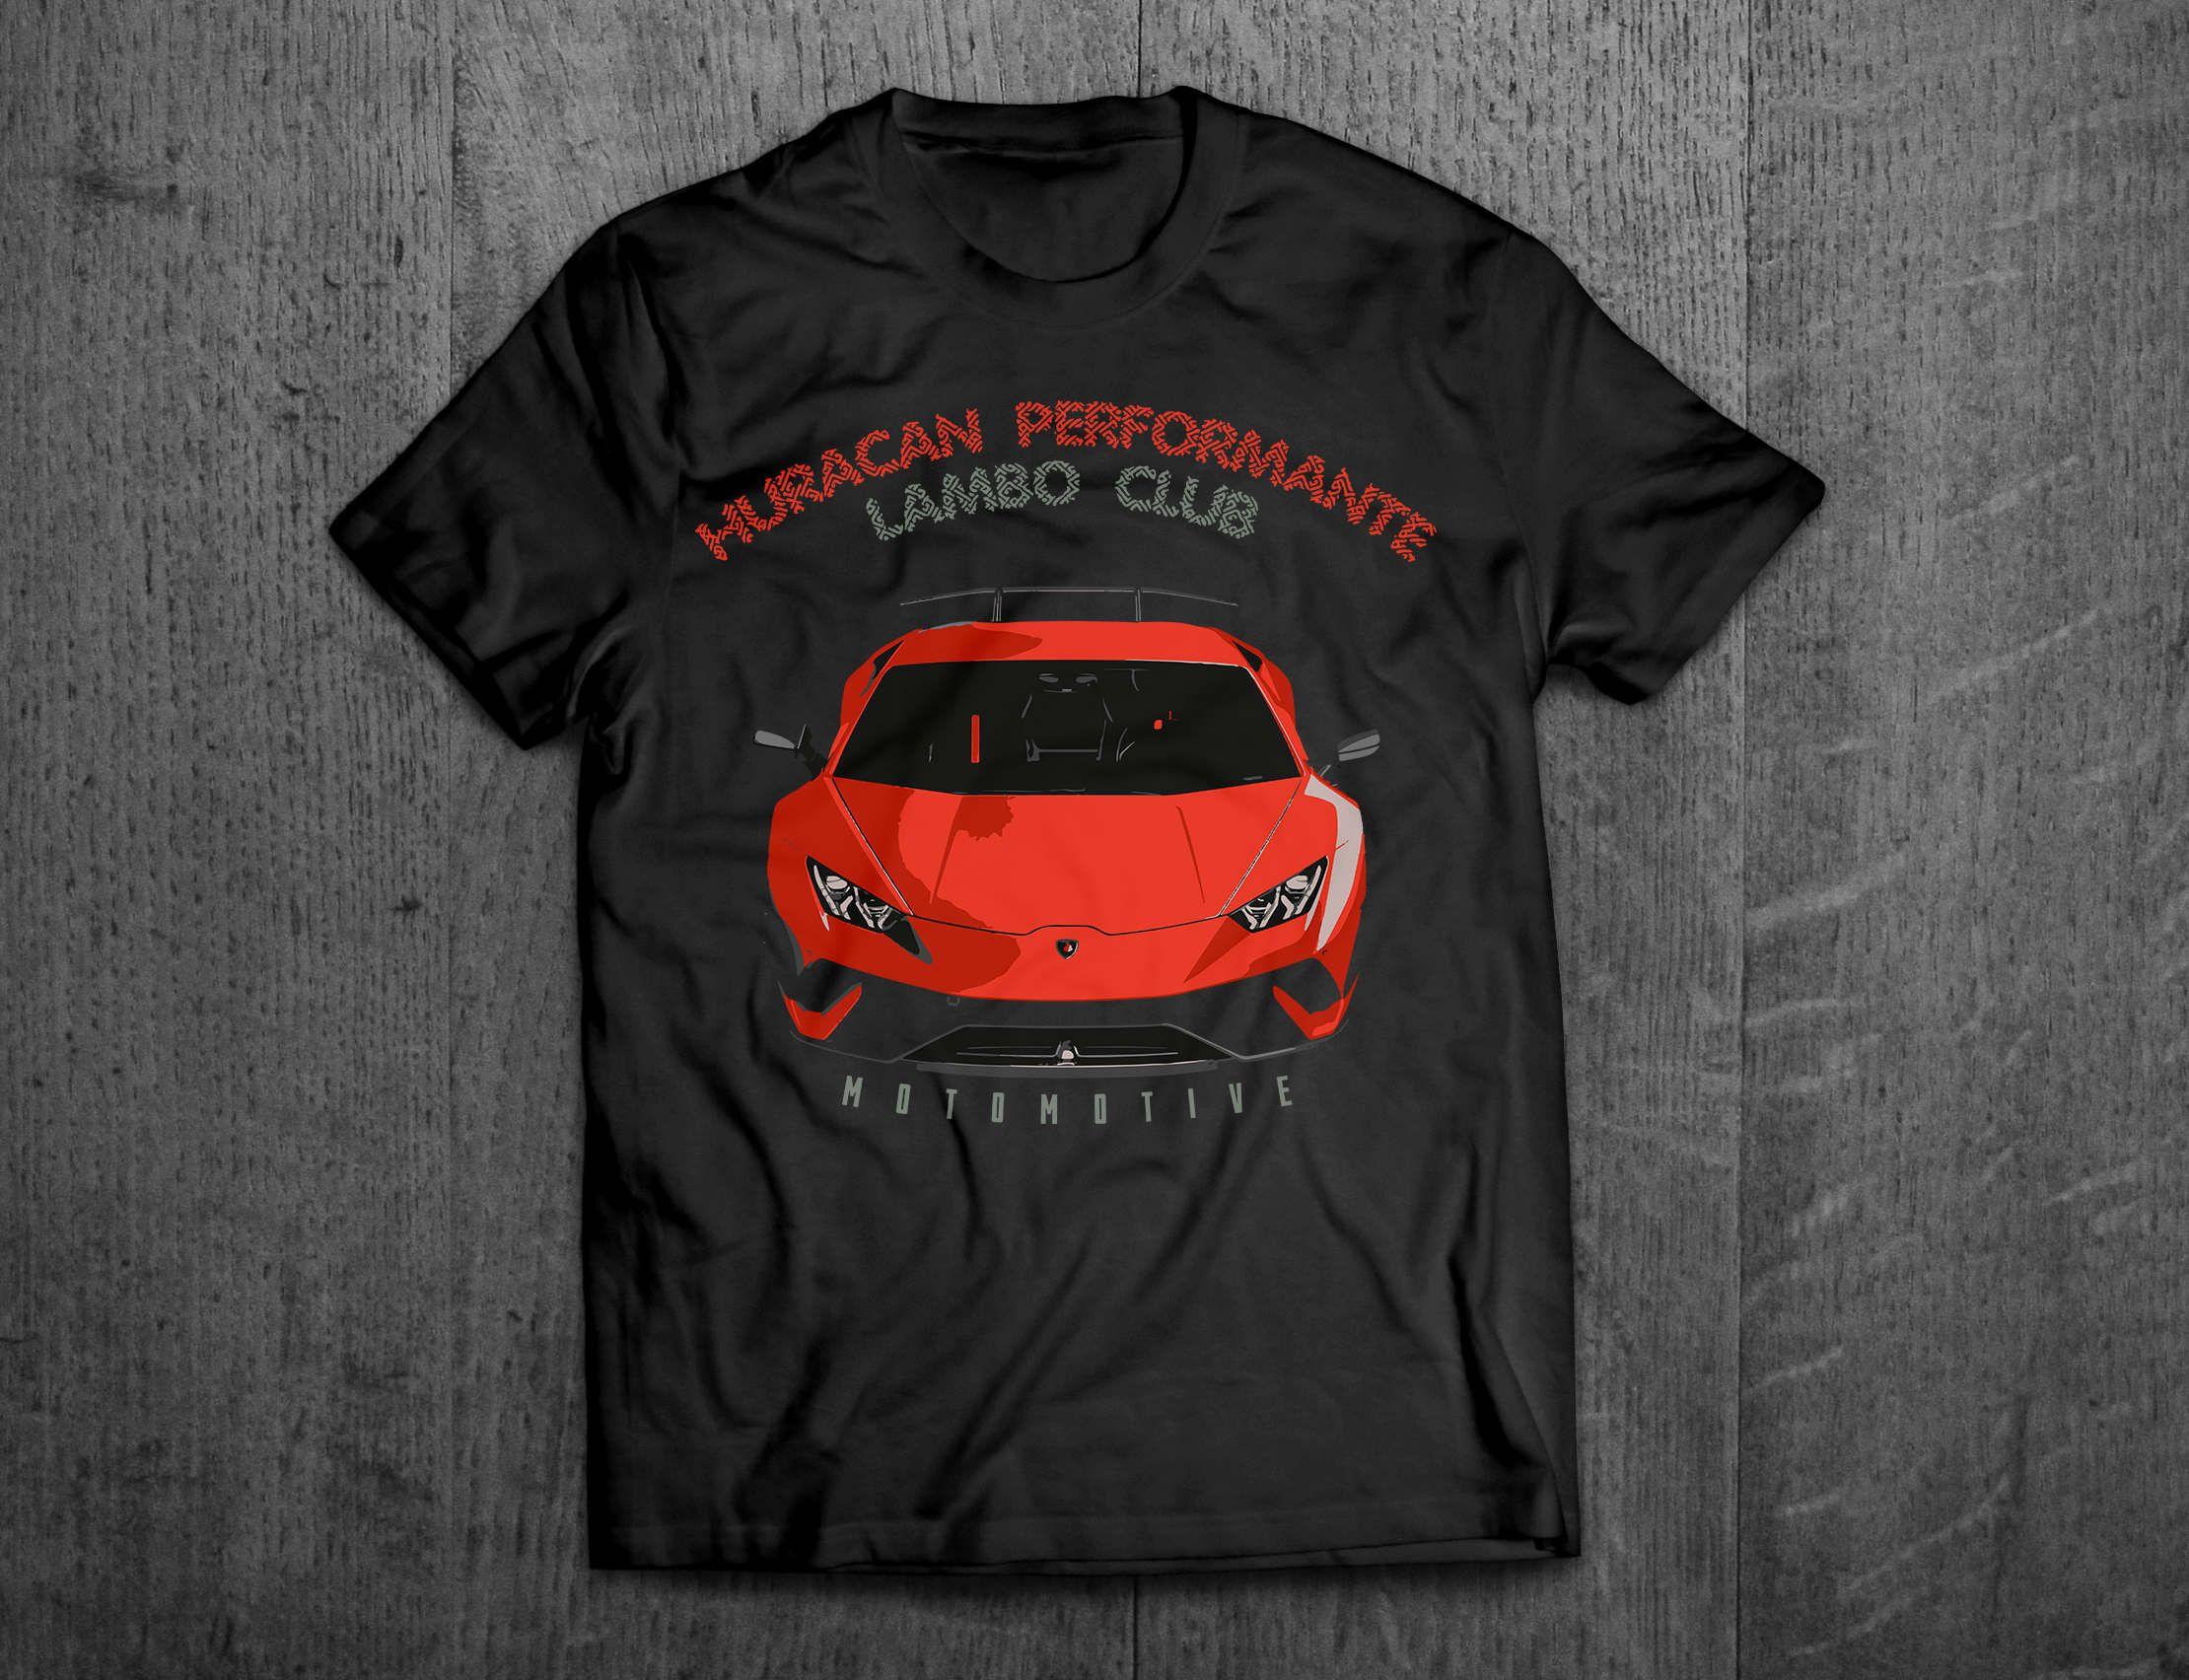 Lamborghini shirts, Lambo t shirts, Lambo Huracan t shirts, men tshirts, women t shirts, muscle car shirts, Cars t shirts, Italian car shirt by MotoMotiveInk on Etsy